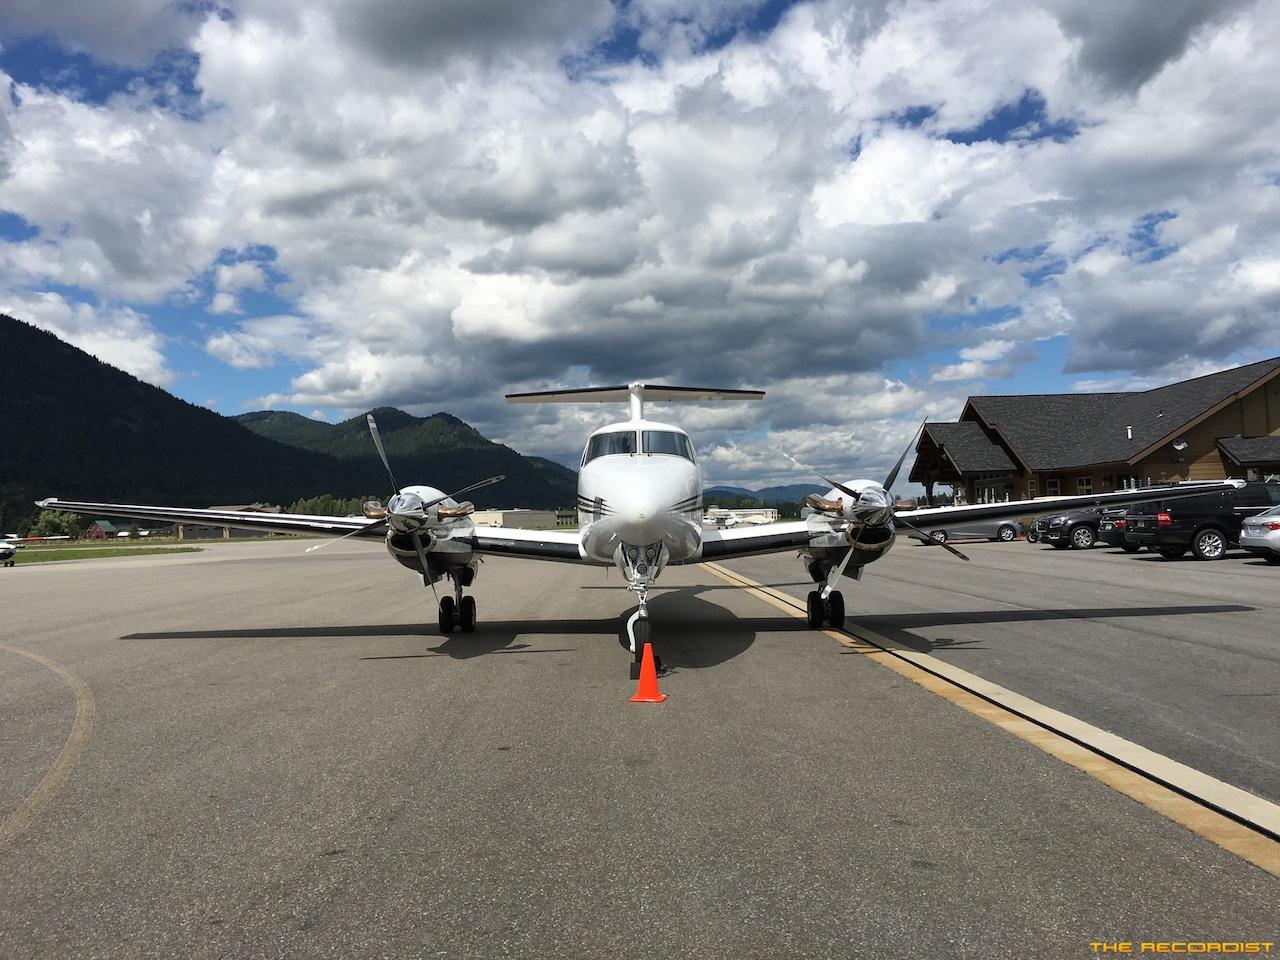 Prop Planes 2 HD Pro Photo Gallery | The Recordist